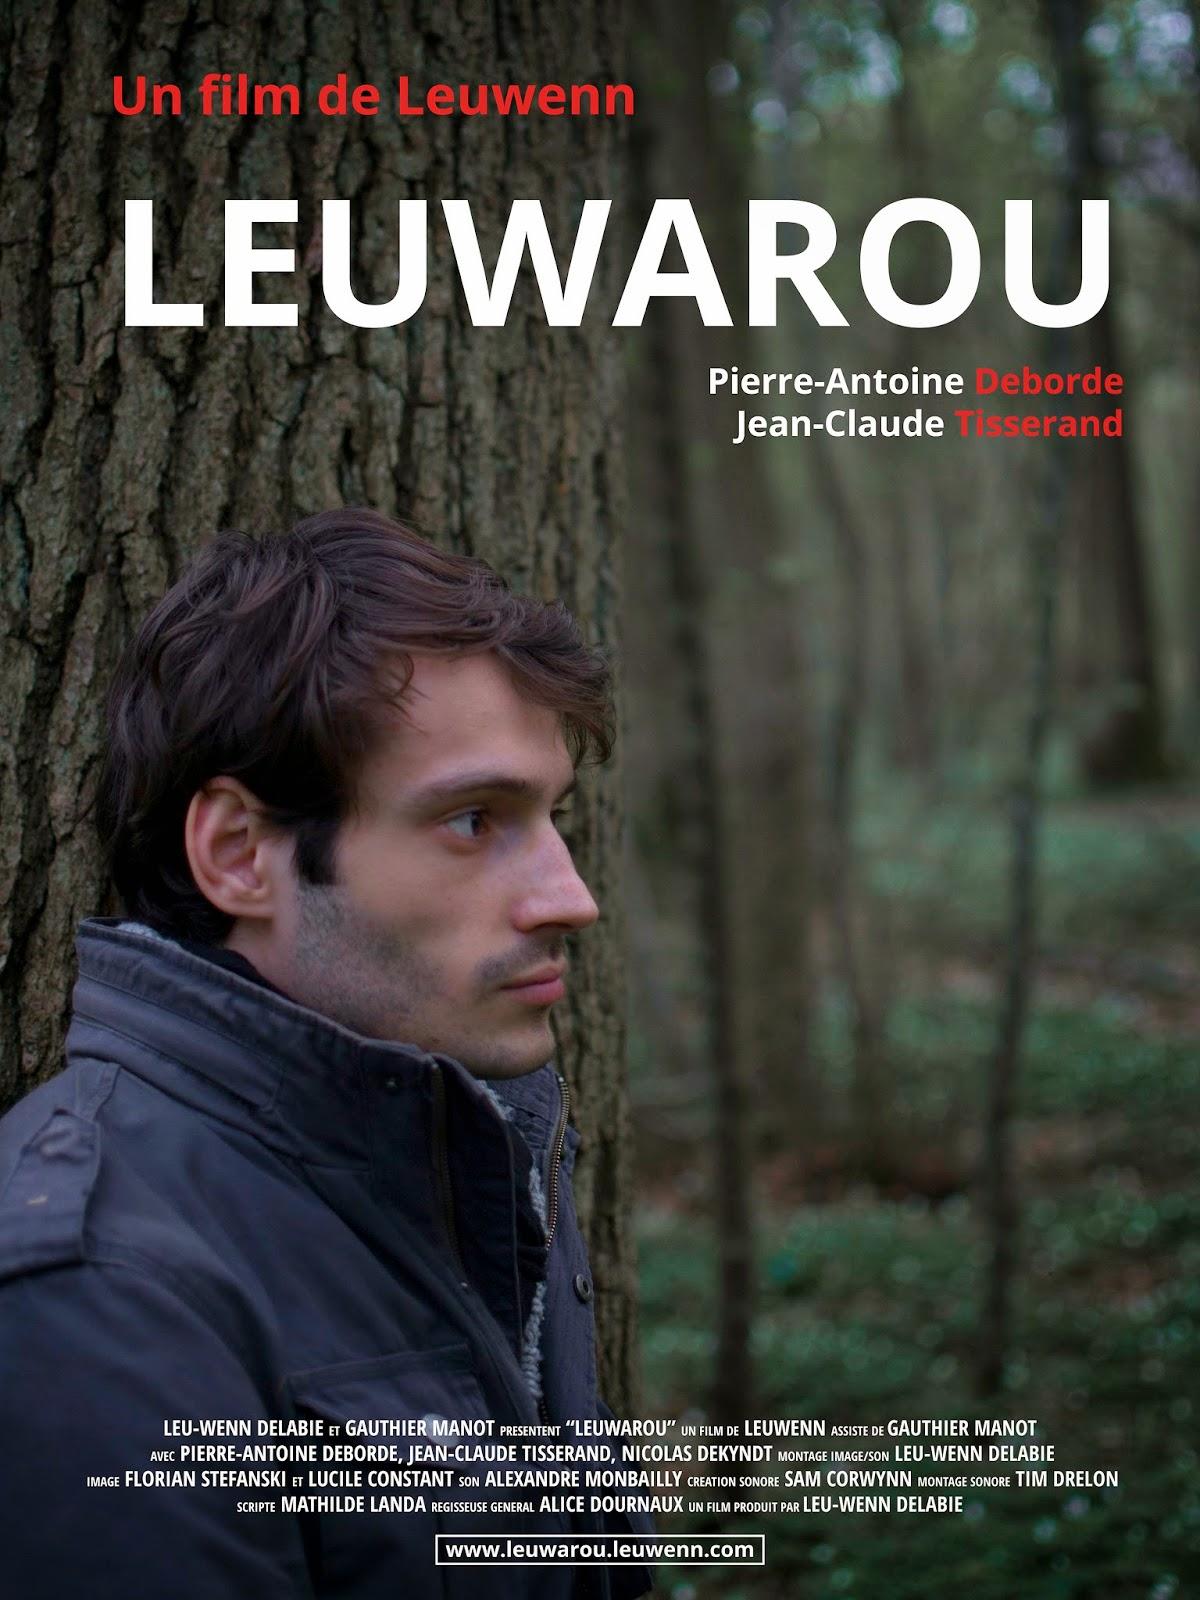 https://www.facebook.com/leuwarou?fref=ts